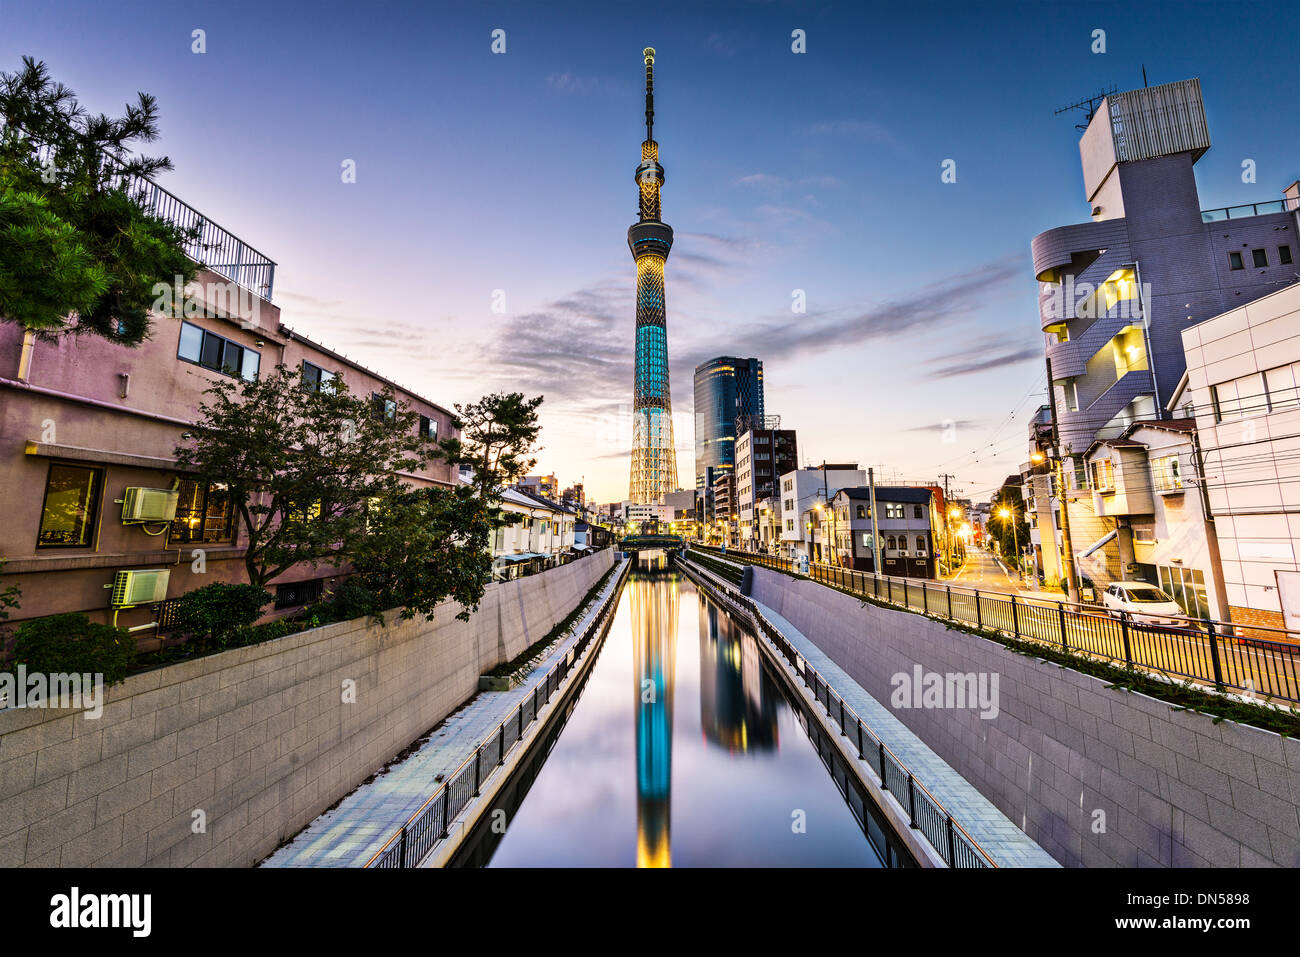 Tokyo, Japan Sumida Ward cityscape. - Stock Image